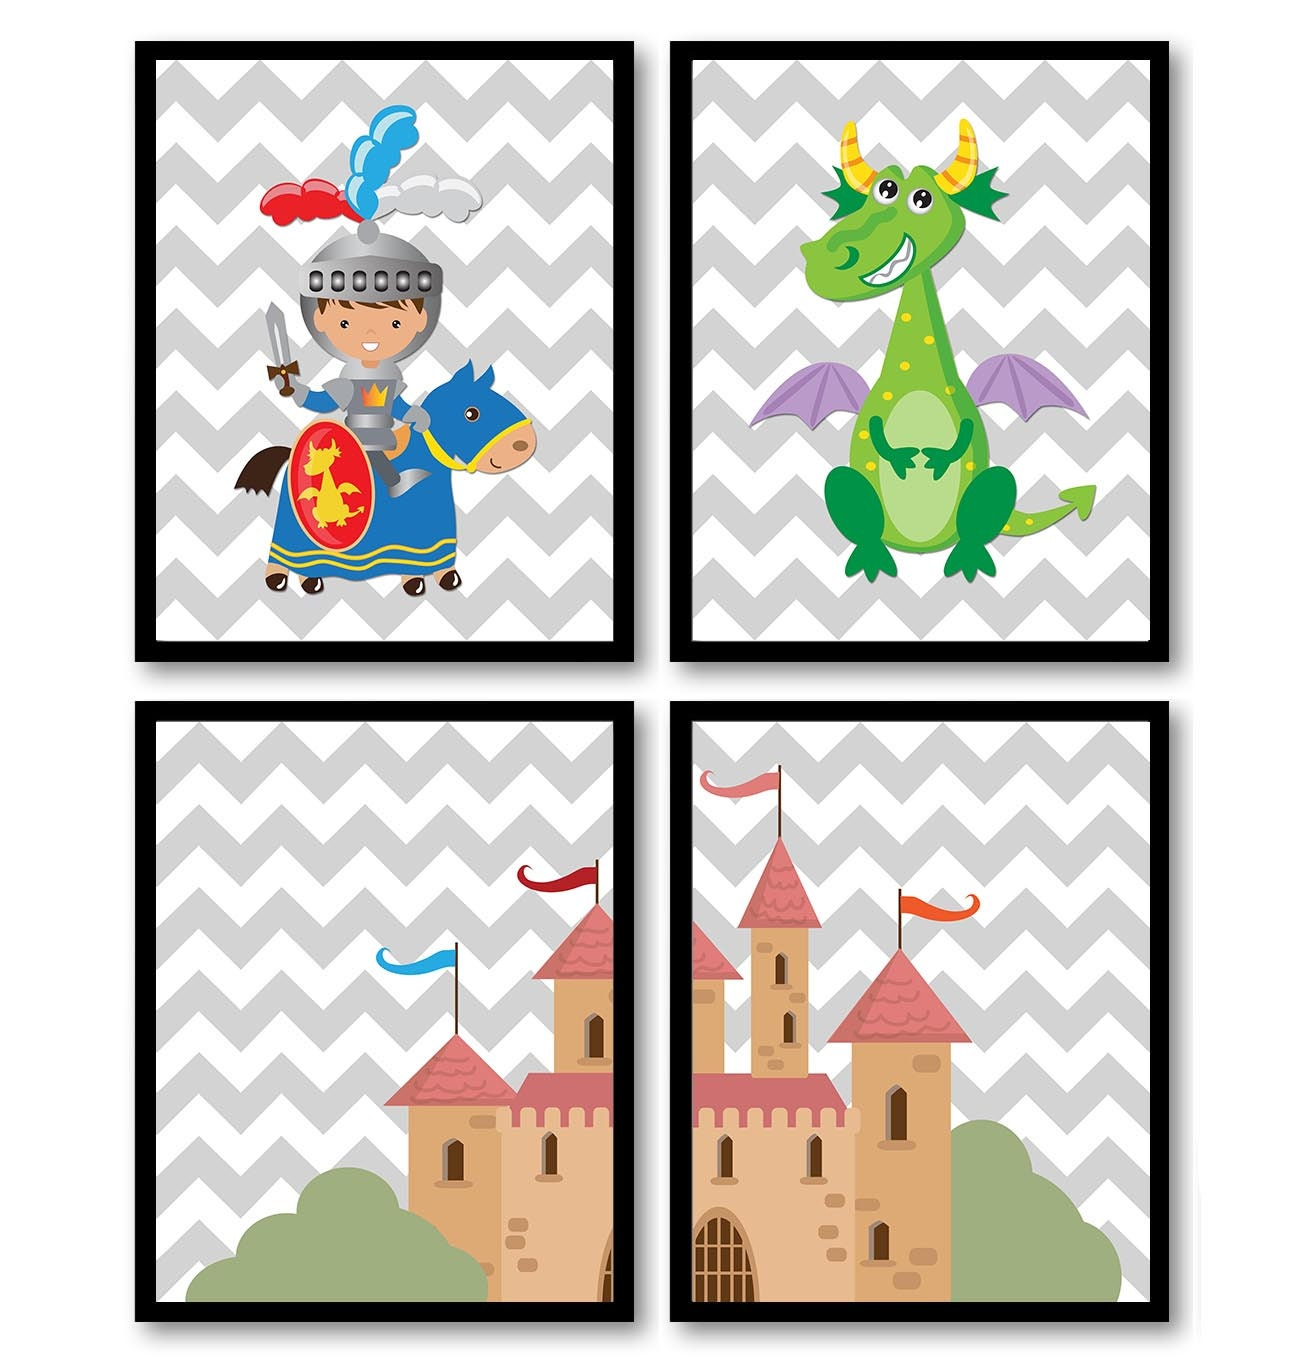 Fairy Tale Nursery Art Child Baby Set of 4 Art Prints Grey Chevron Boy Knight Dragon Castle Kids Roo